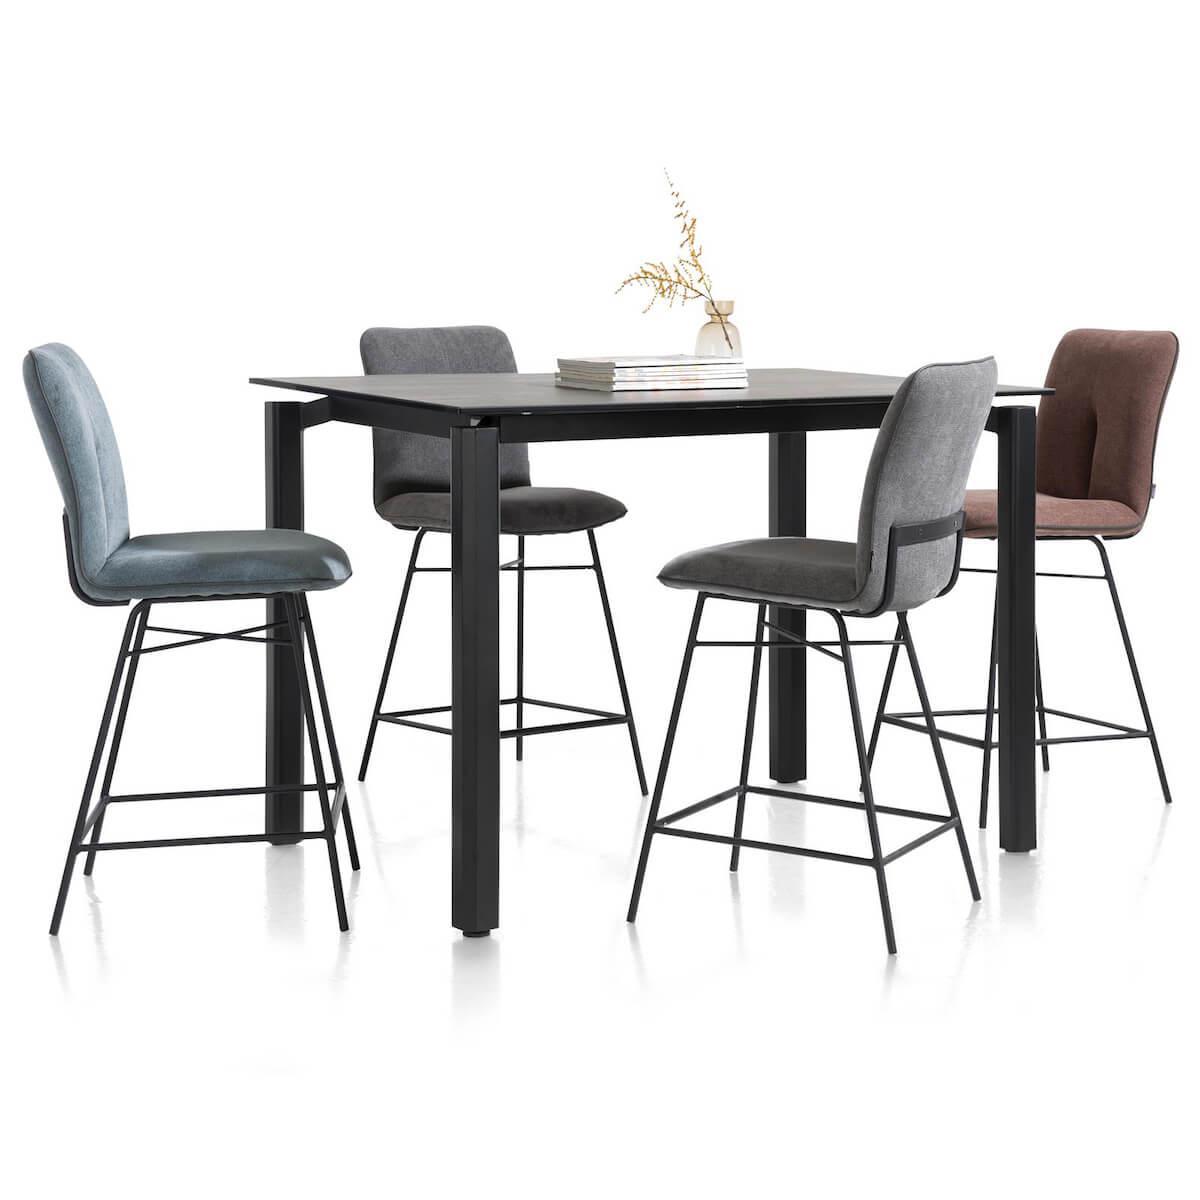 Table de bar 100x130cm IMPERIAL Xooon